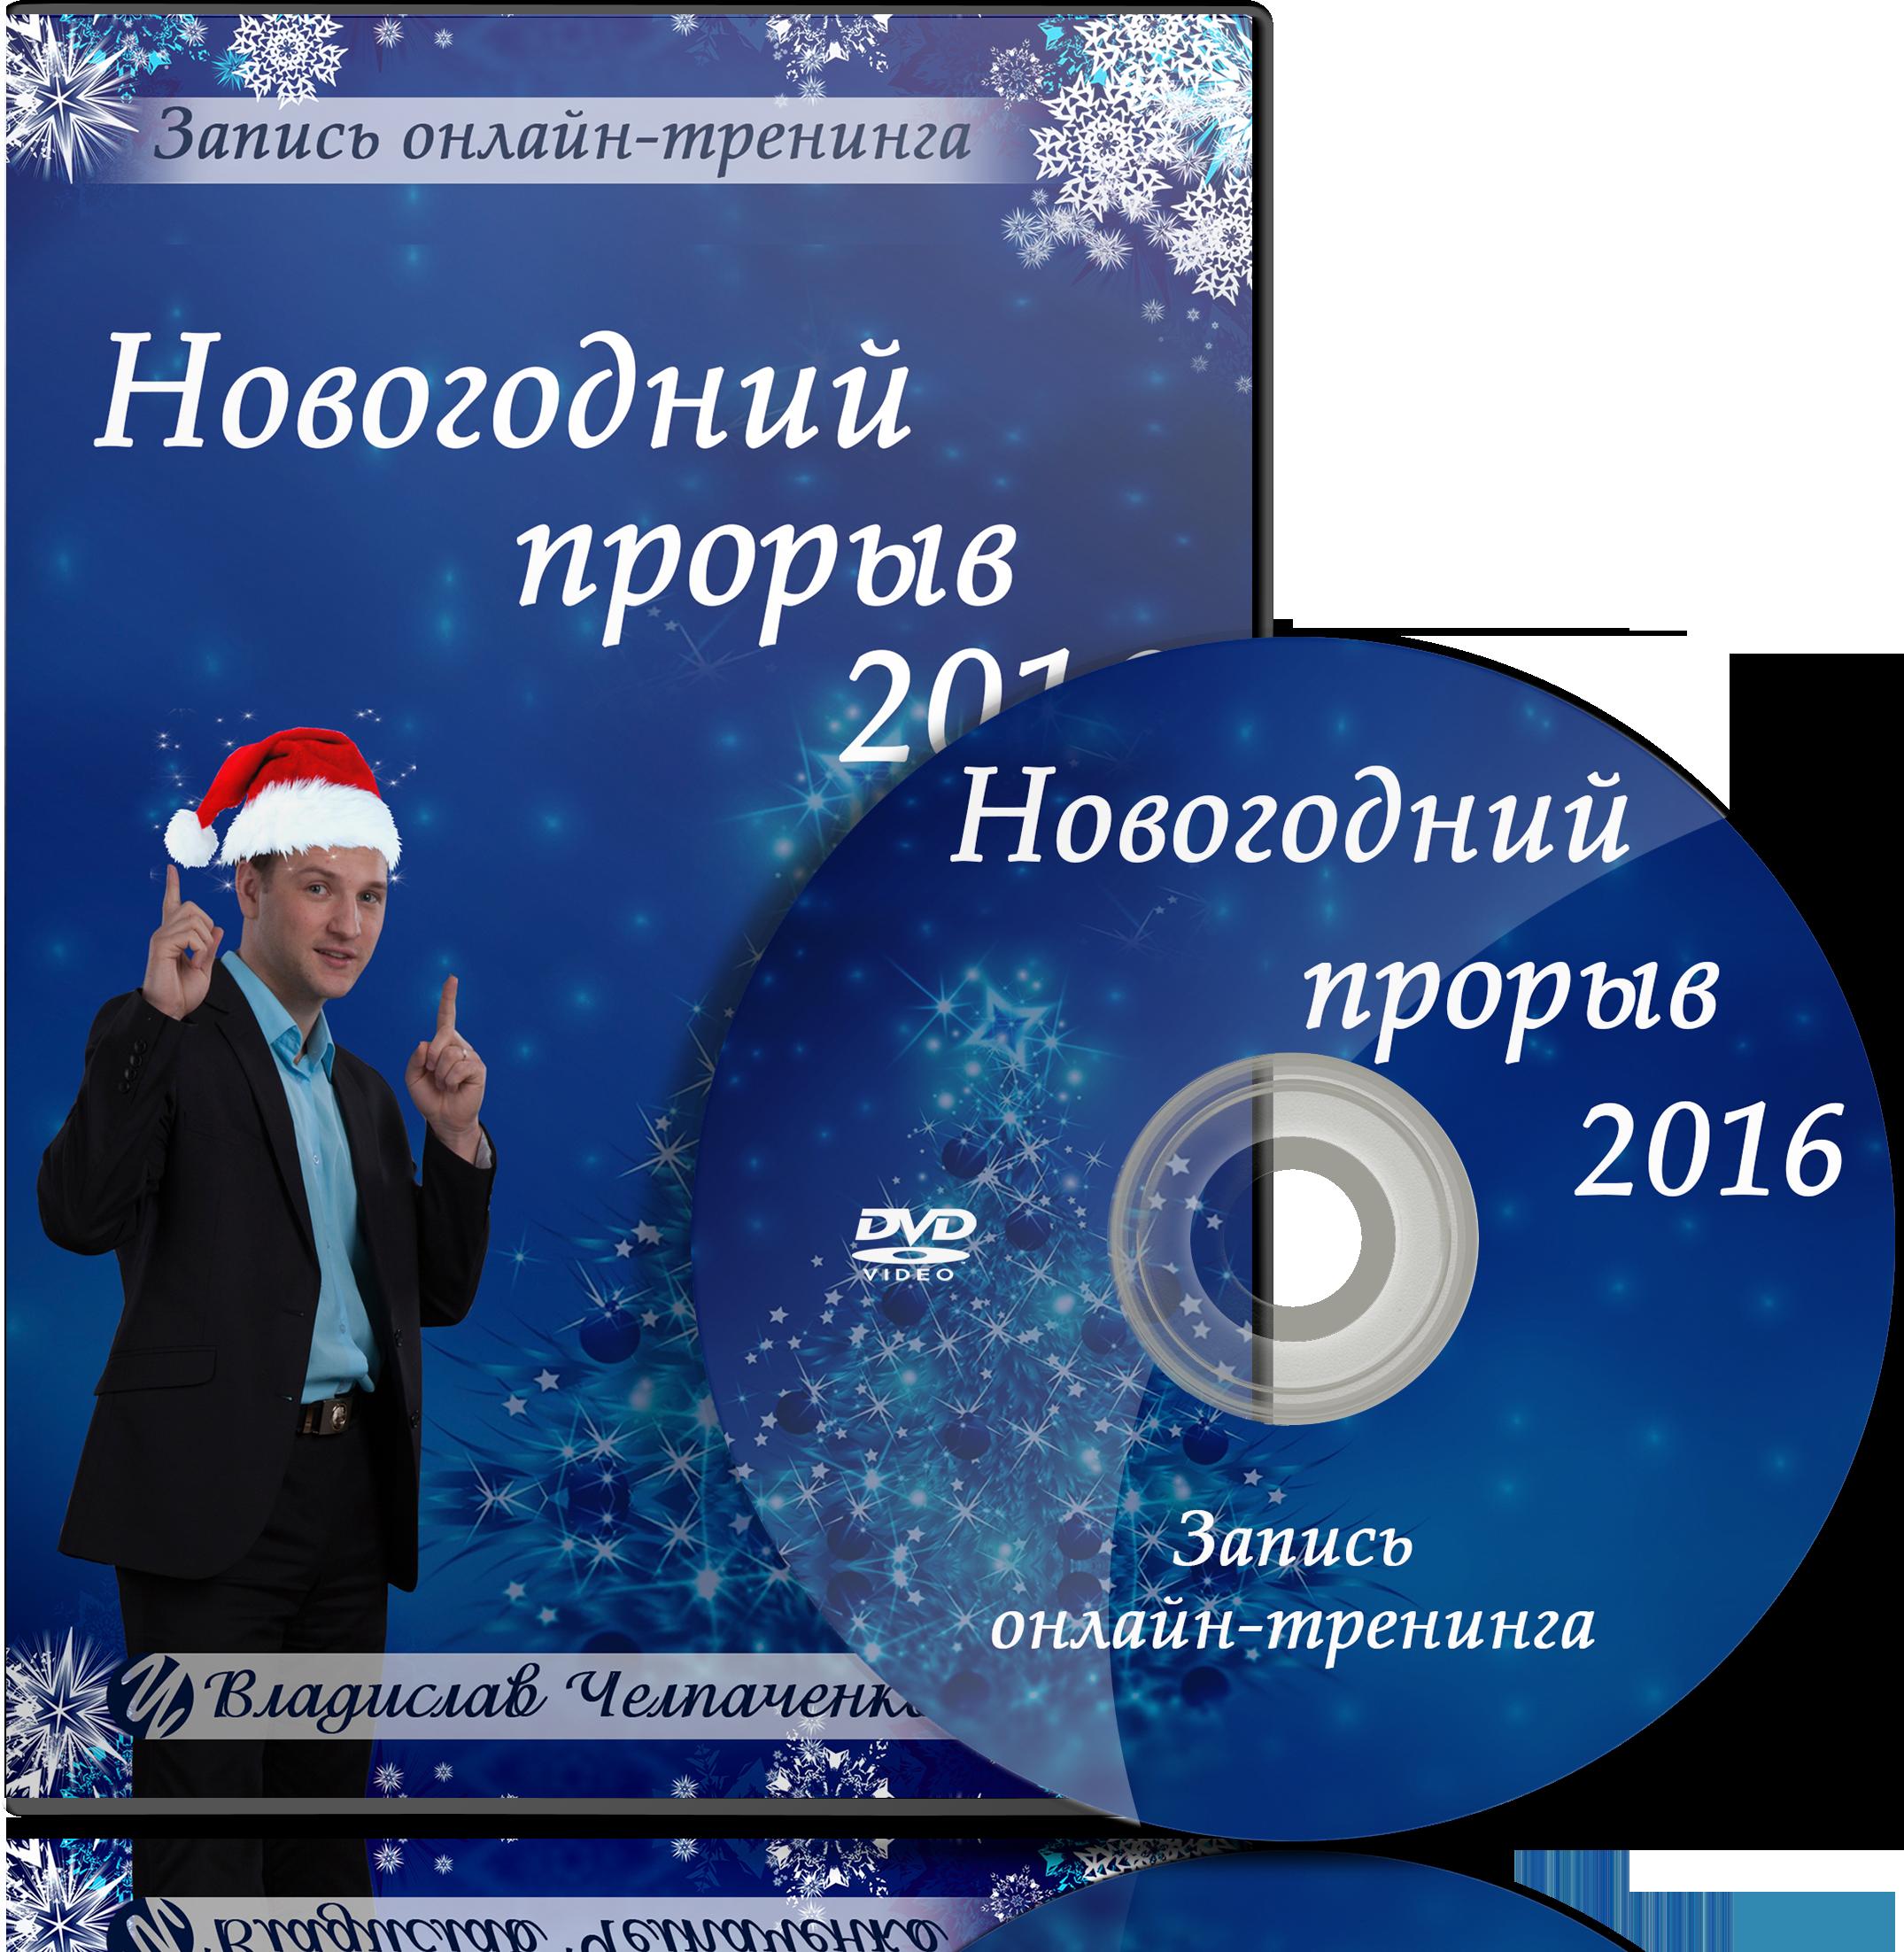 DVD-Диск 1